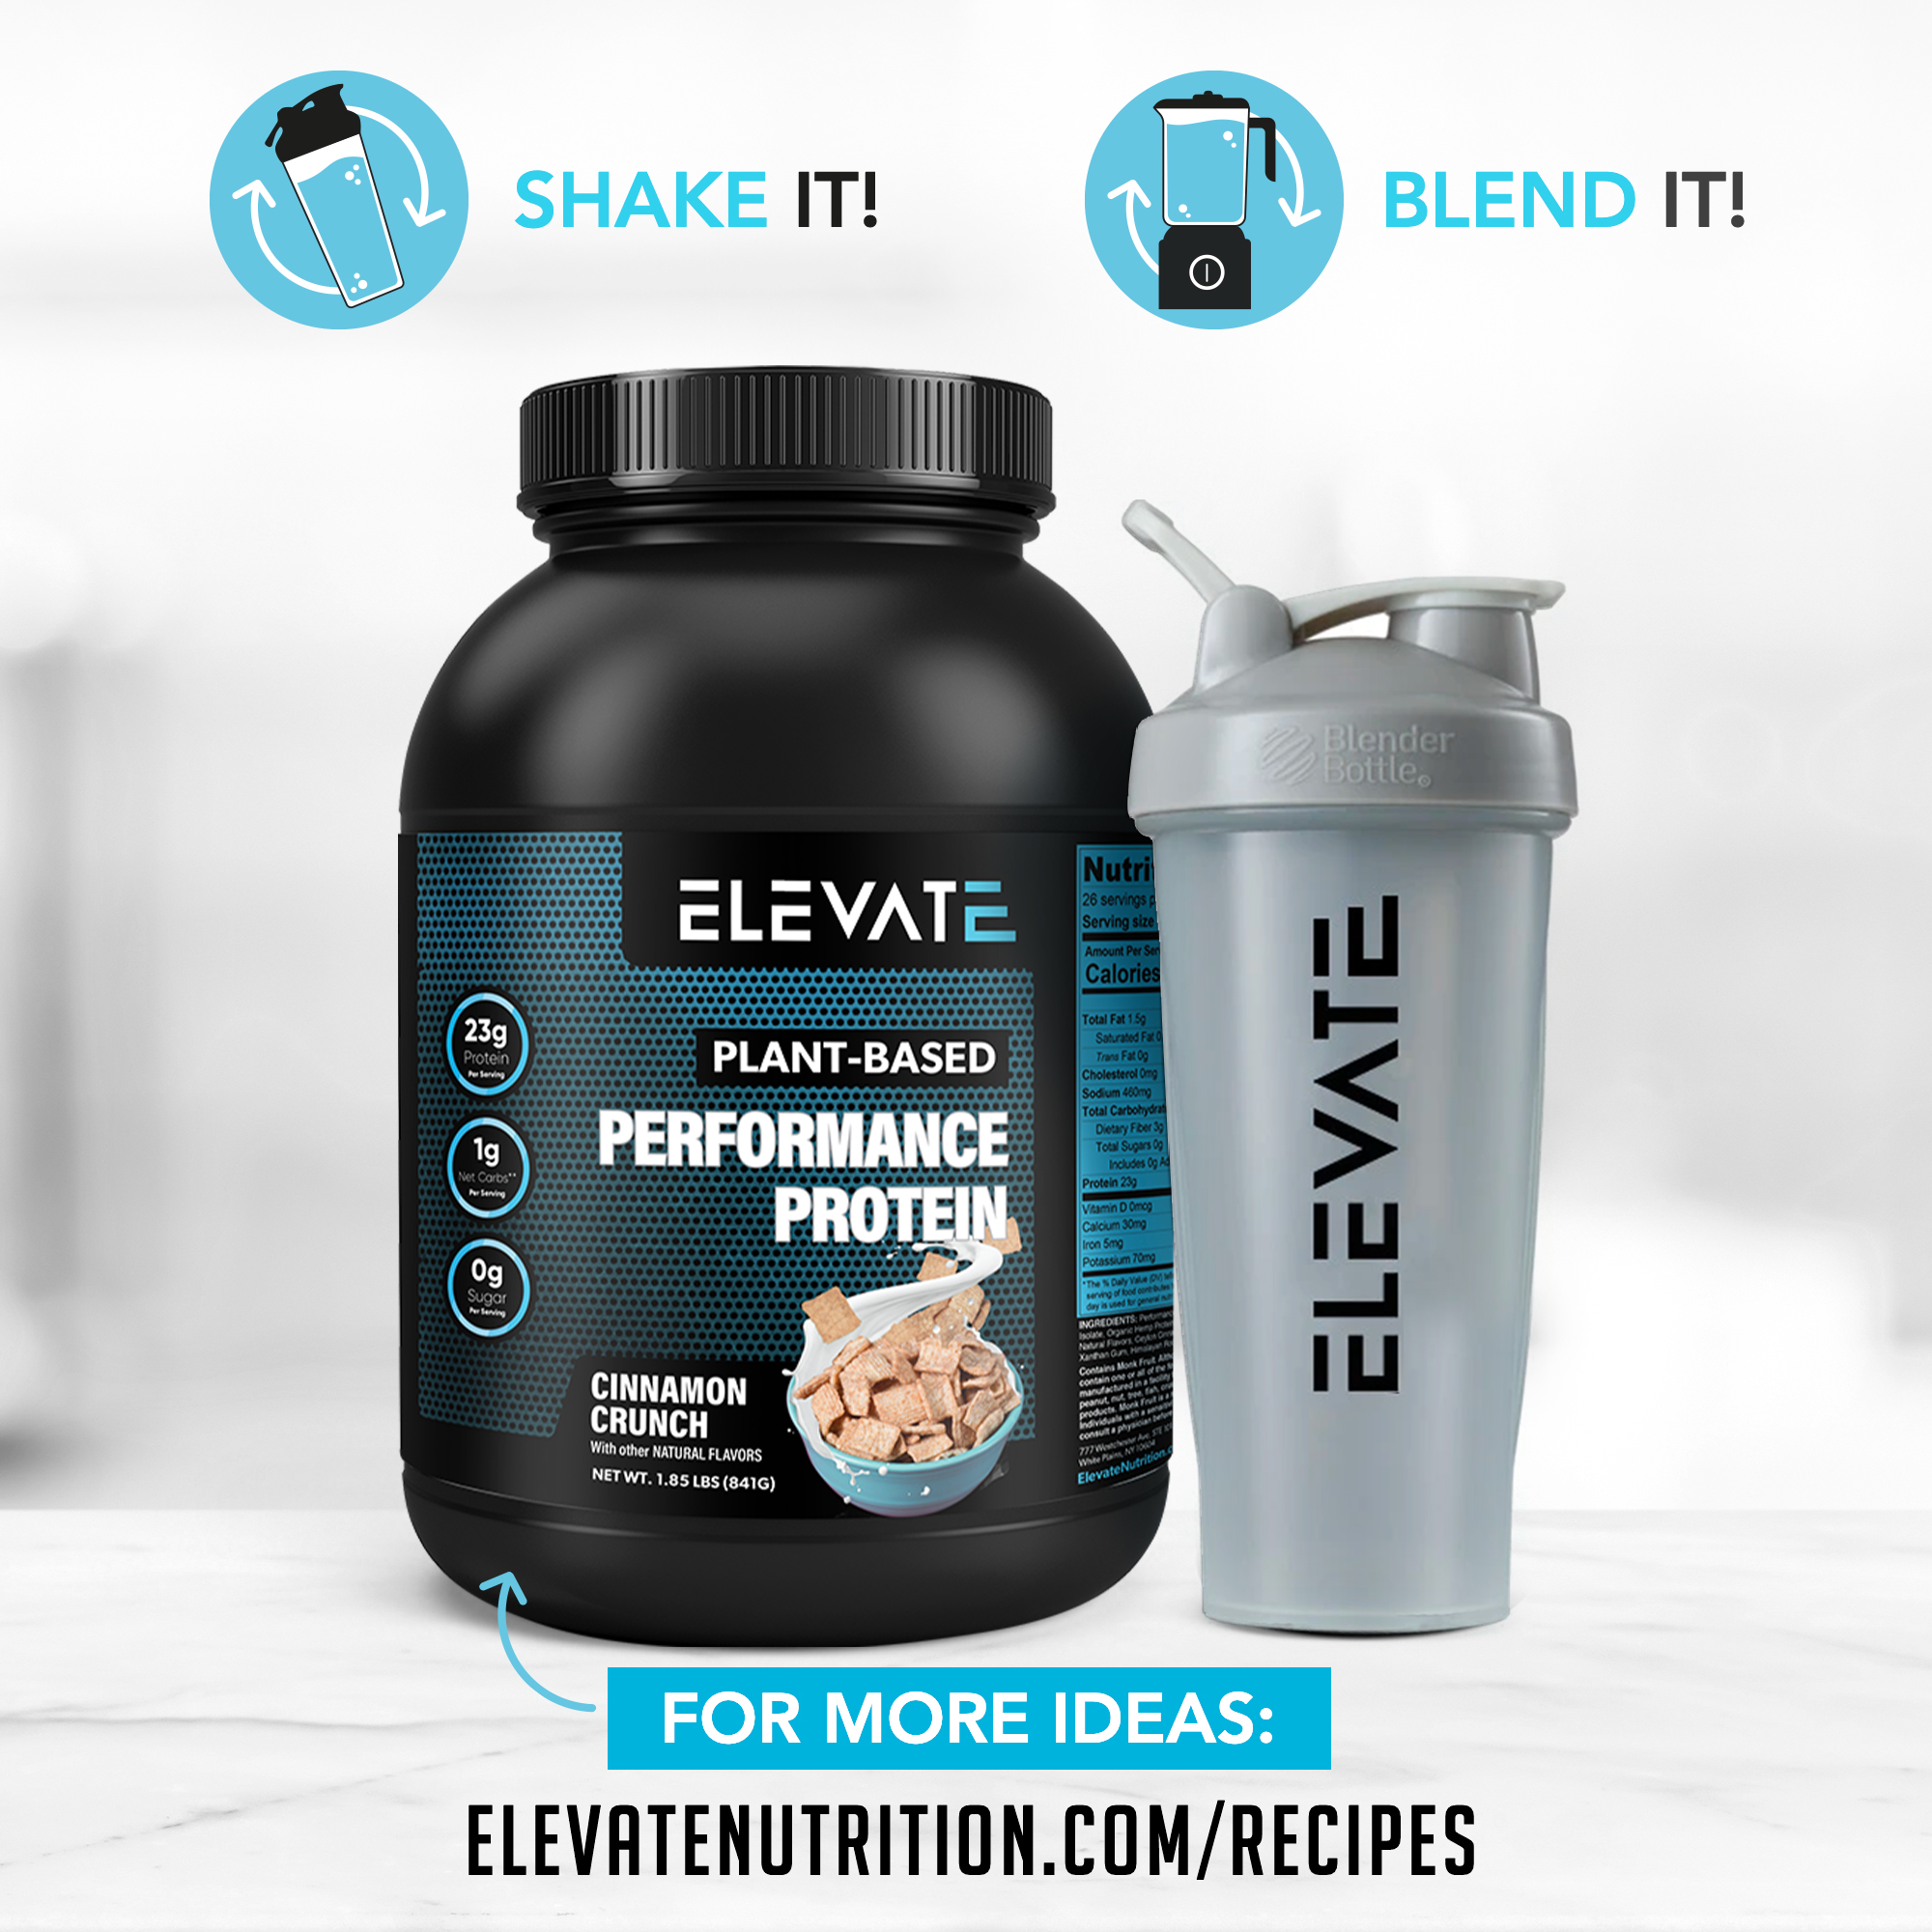 create-shakes-and-recipes-using-elevate-vegan-cinnamon-crunch-protein-powder